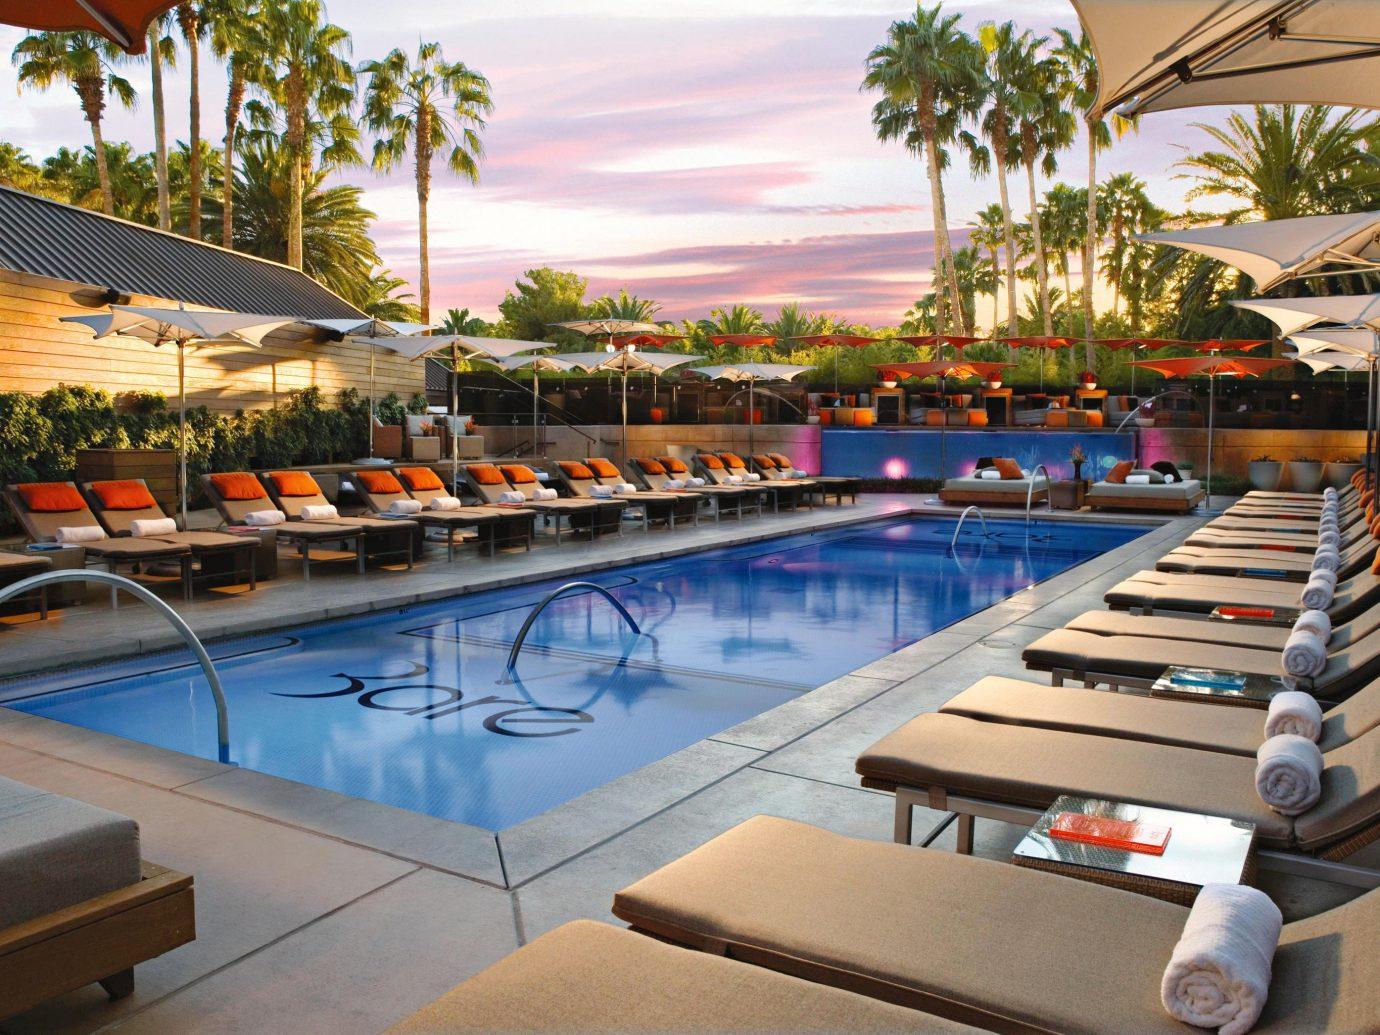 Hotels Living Lounge Luxury Modern Pool Trip Ideas swimming pool leisure outdoor Resort property estate vacation condominium Villa real estate furniture